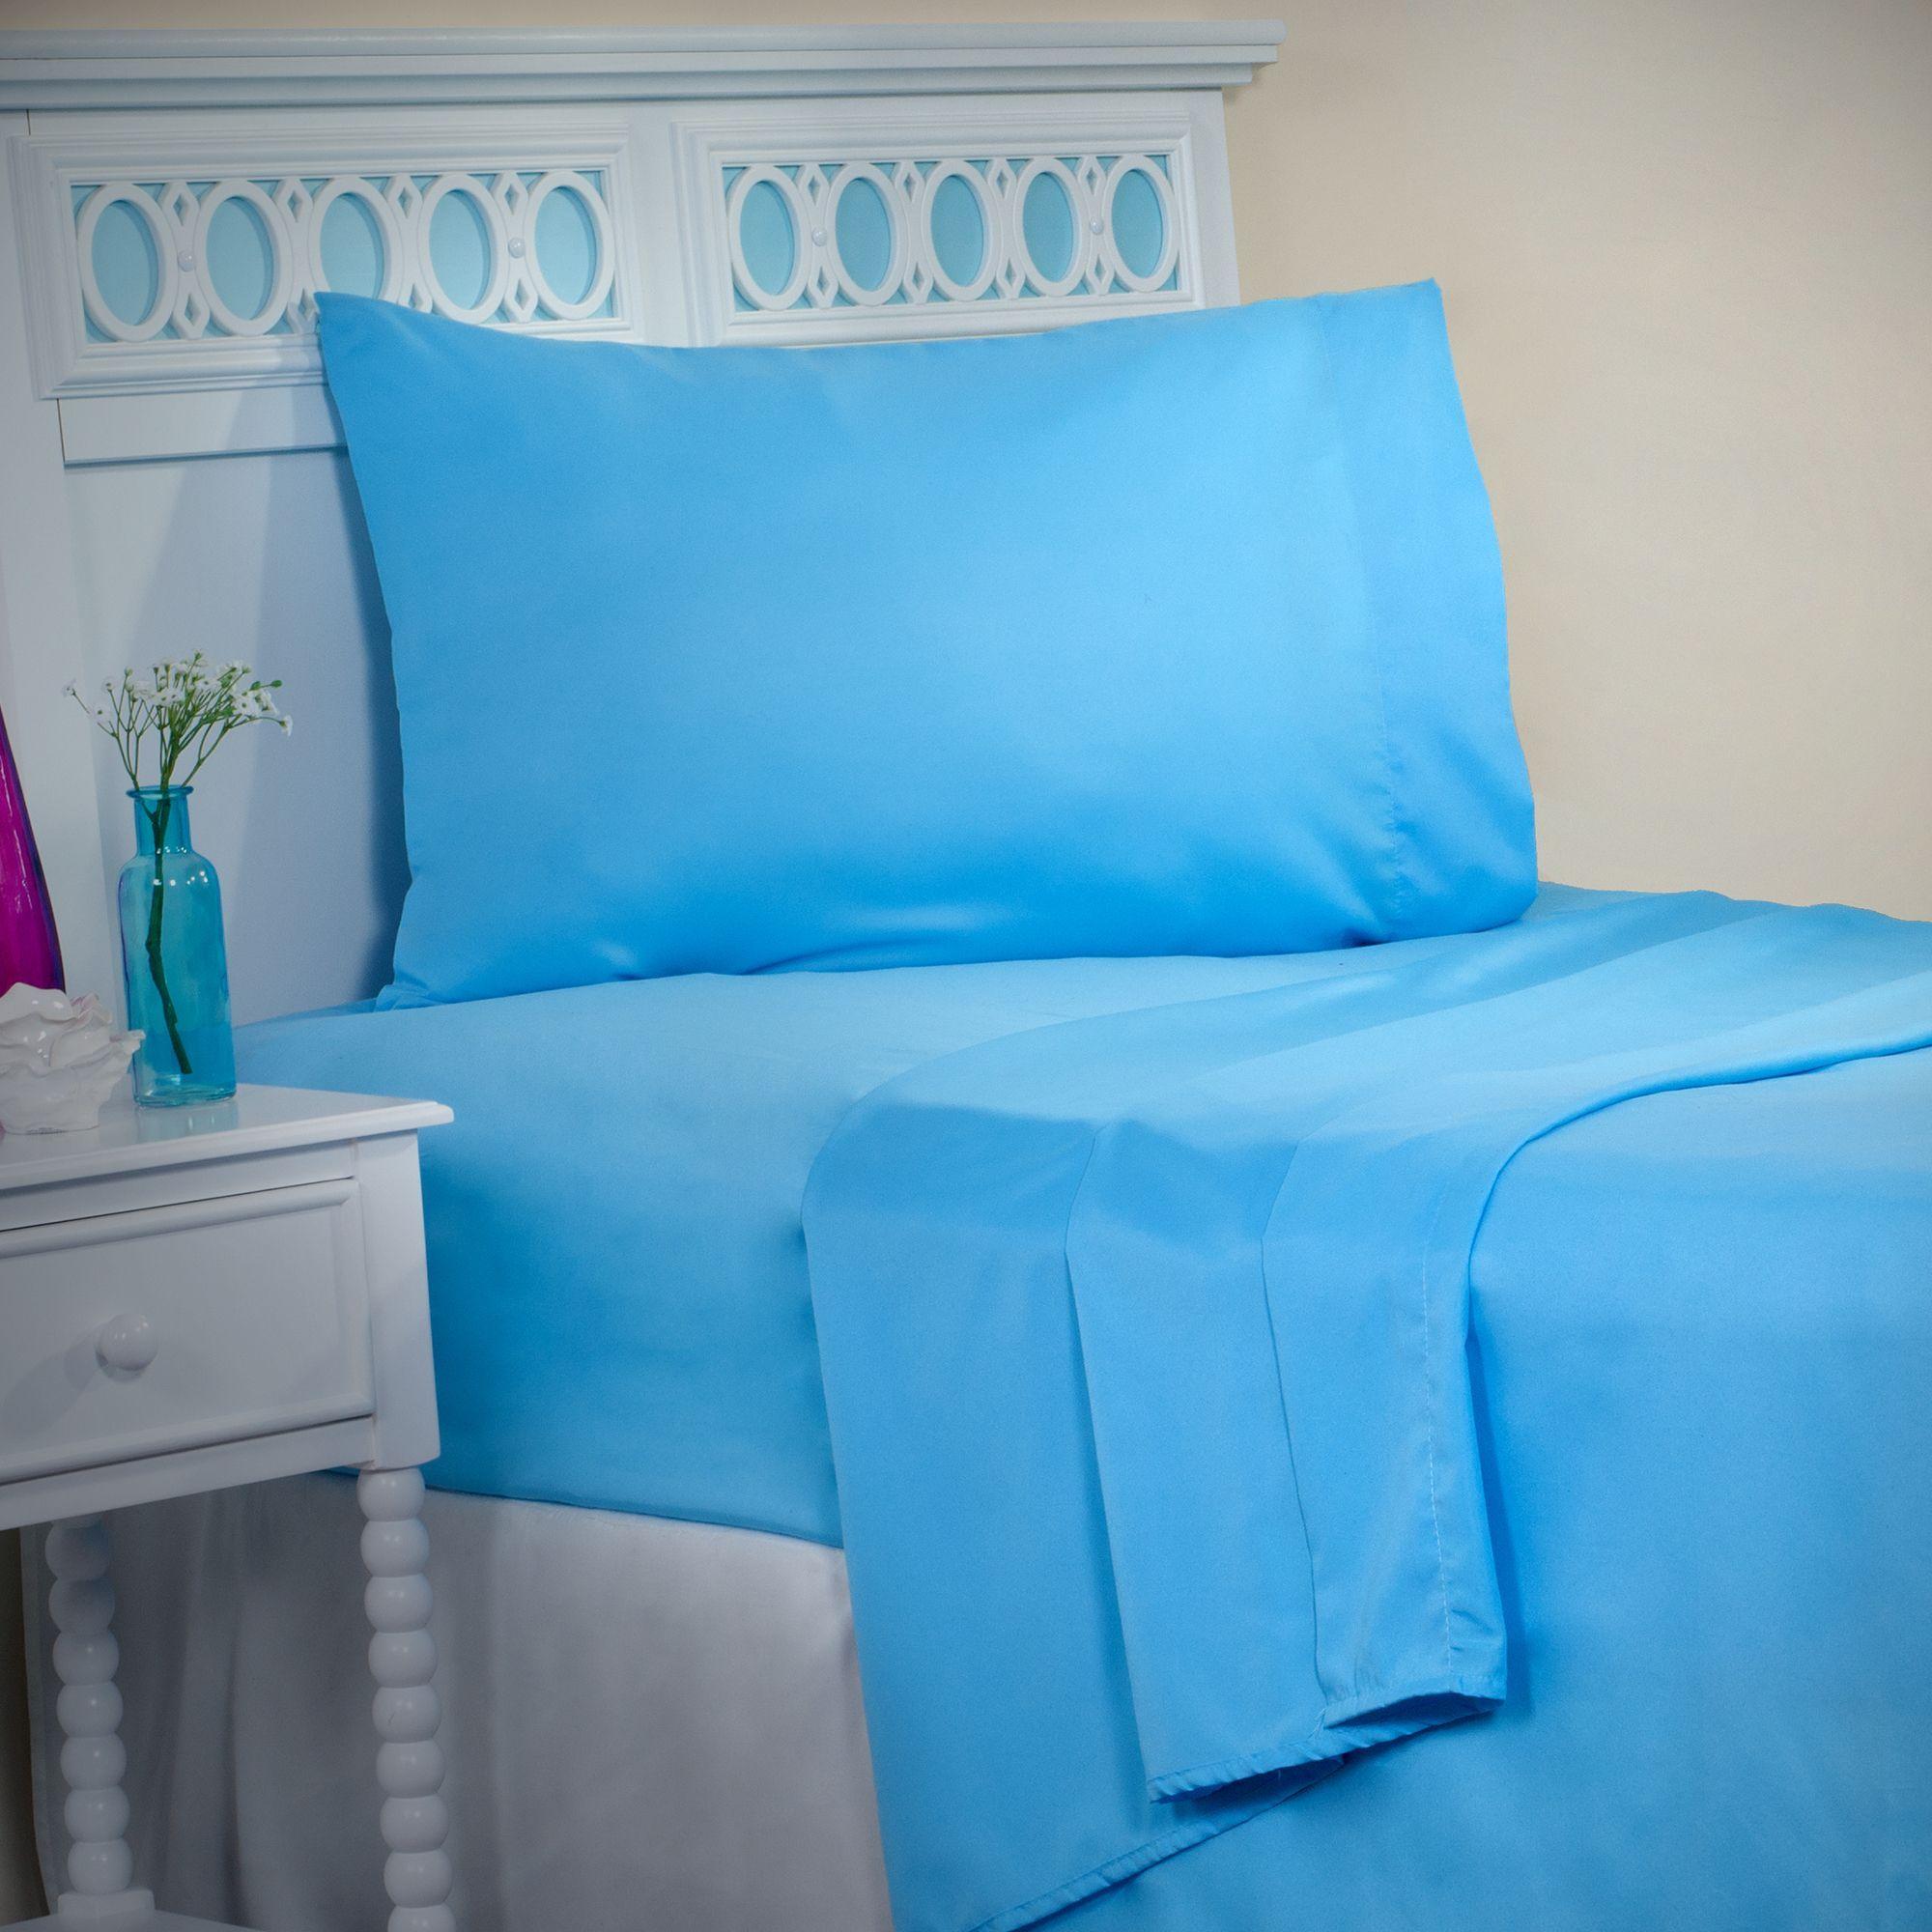 Twin XL Series 1200 3 Piece Sheet Set, Bedding Lavish Home